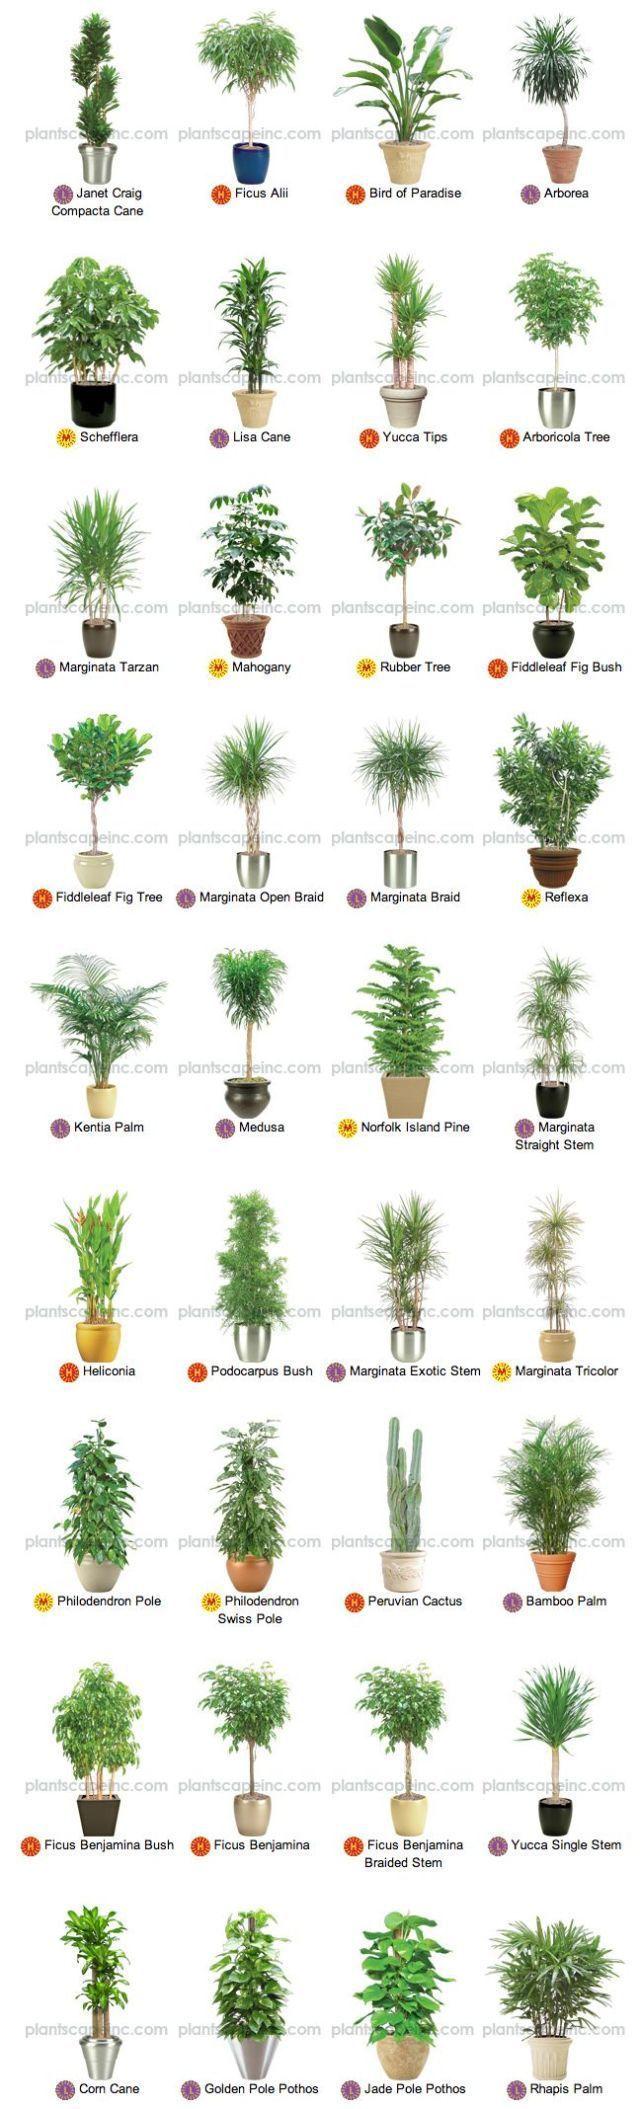 home plants flowers inspiration 4 #flowersplantsindoor